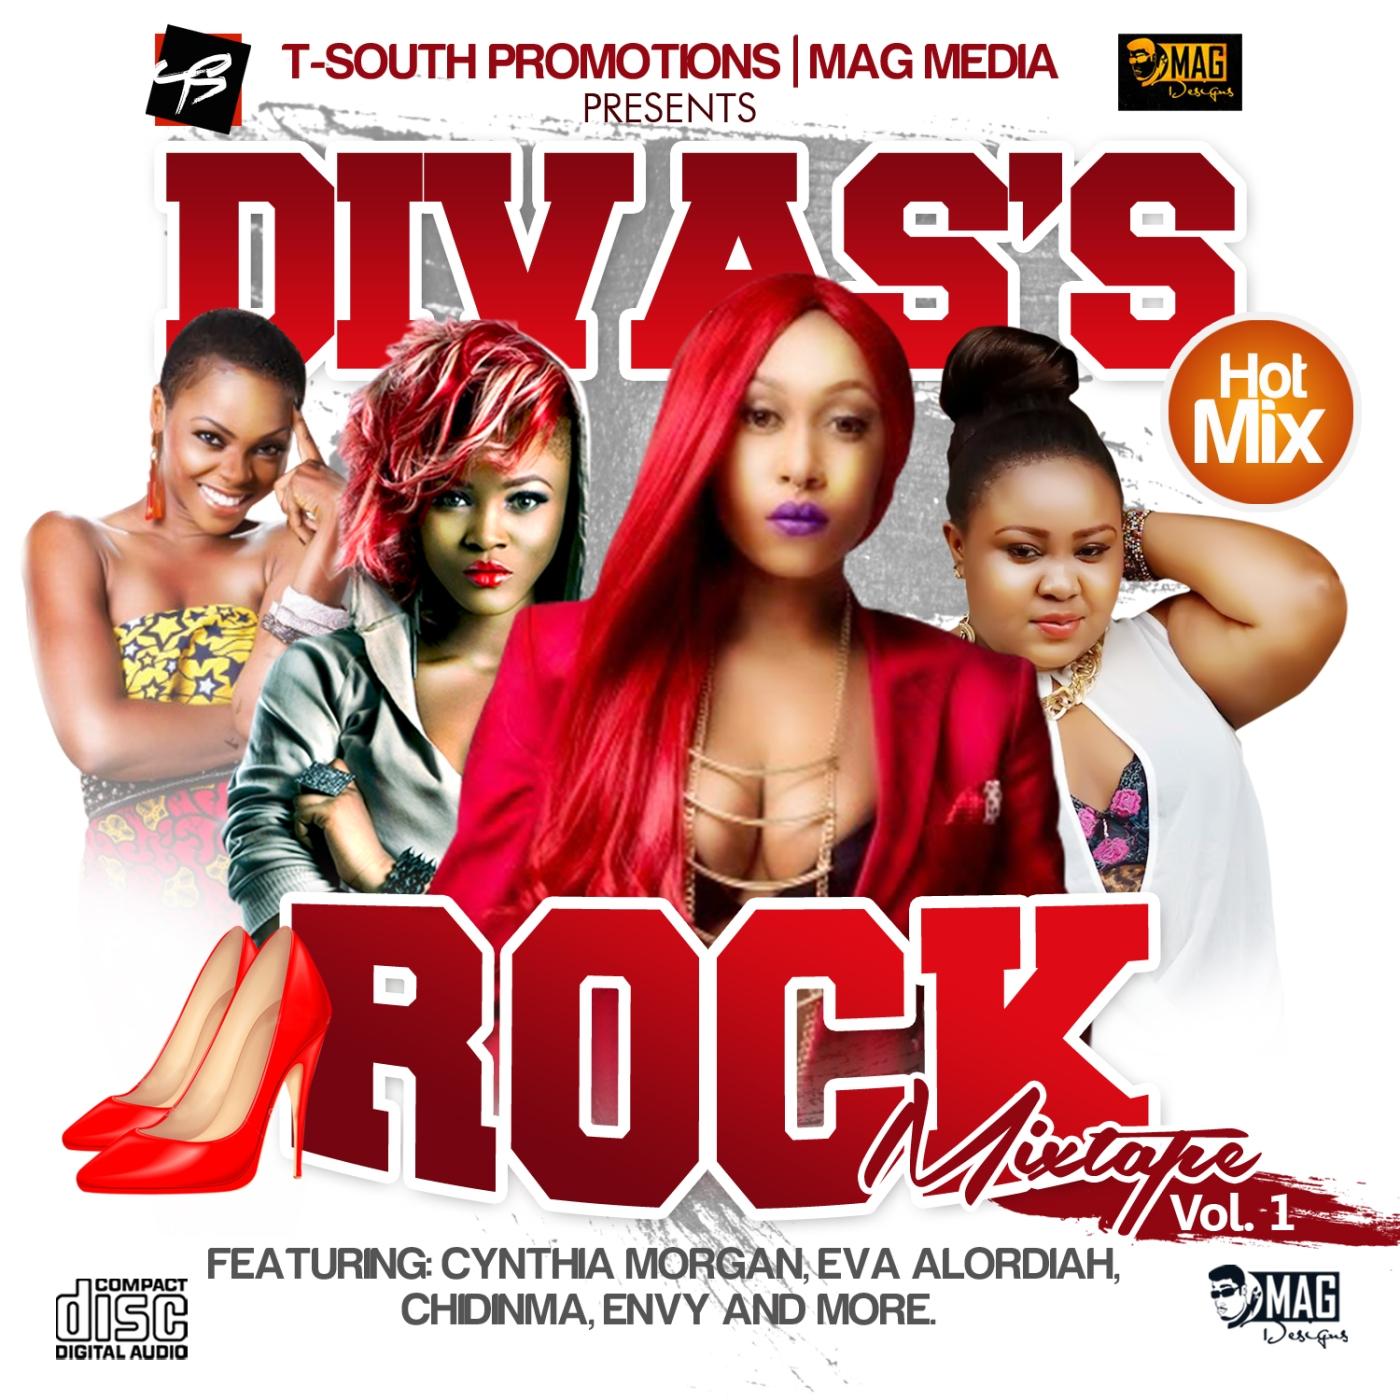 MIXTAPE ] DVE – Divas rock mixtape vol 1 – iPROMOTE-9JA BUSINESS AND